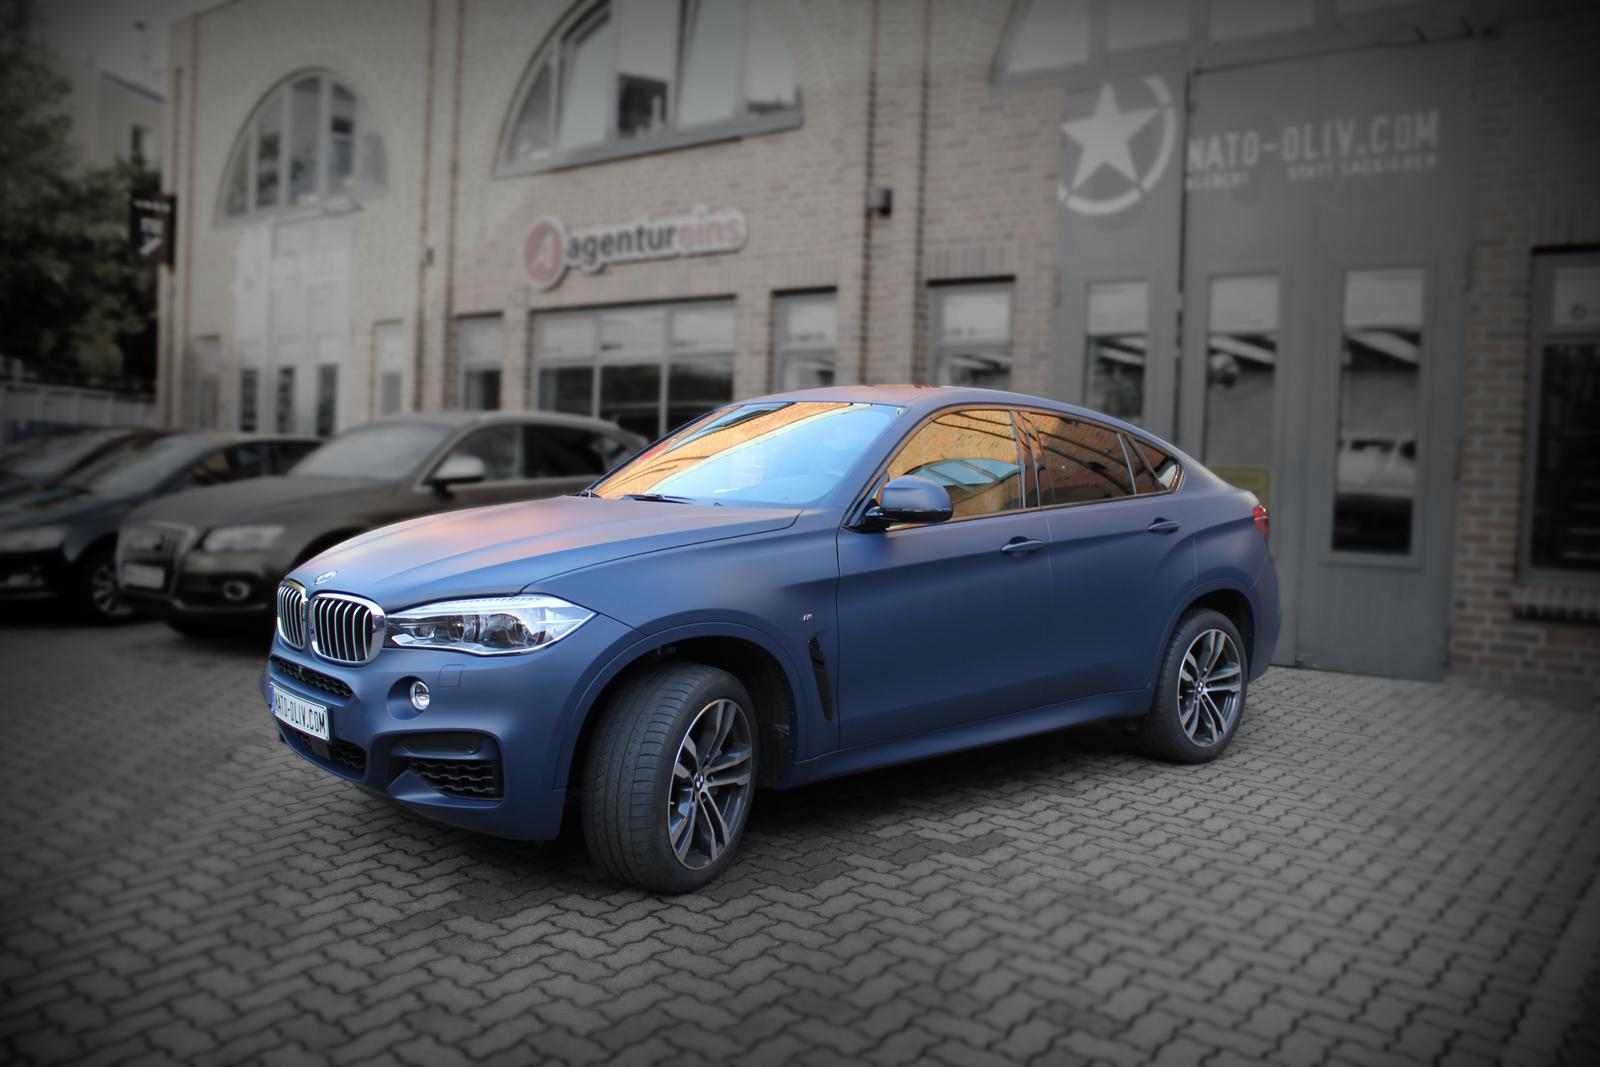 BMW_X6_CAR-WRAPPING_YACHTBLAU_MATT_Titelbild